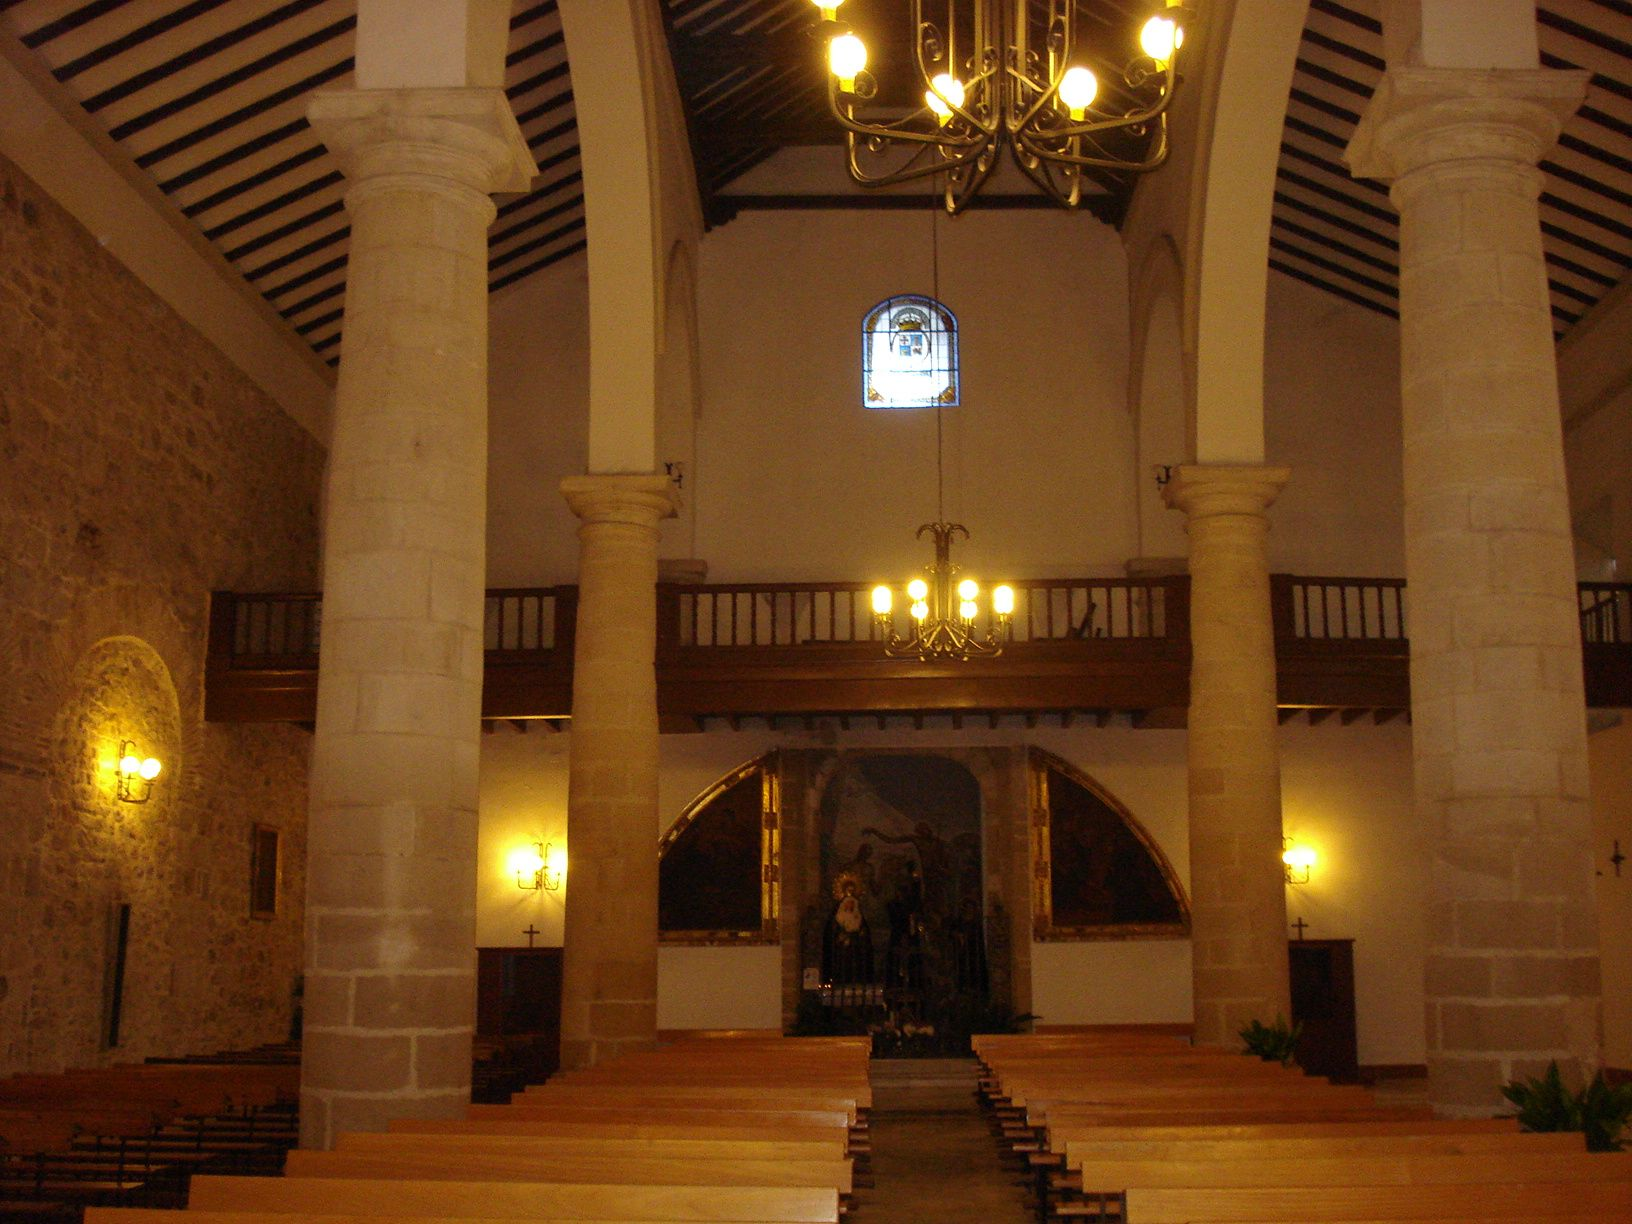 panoramica de la iglesia